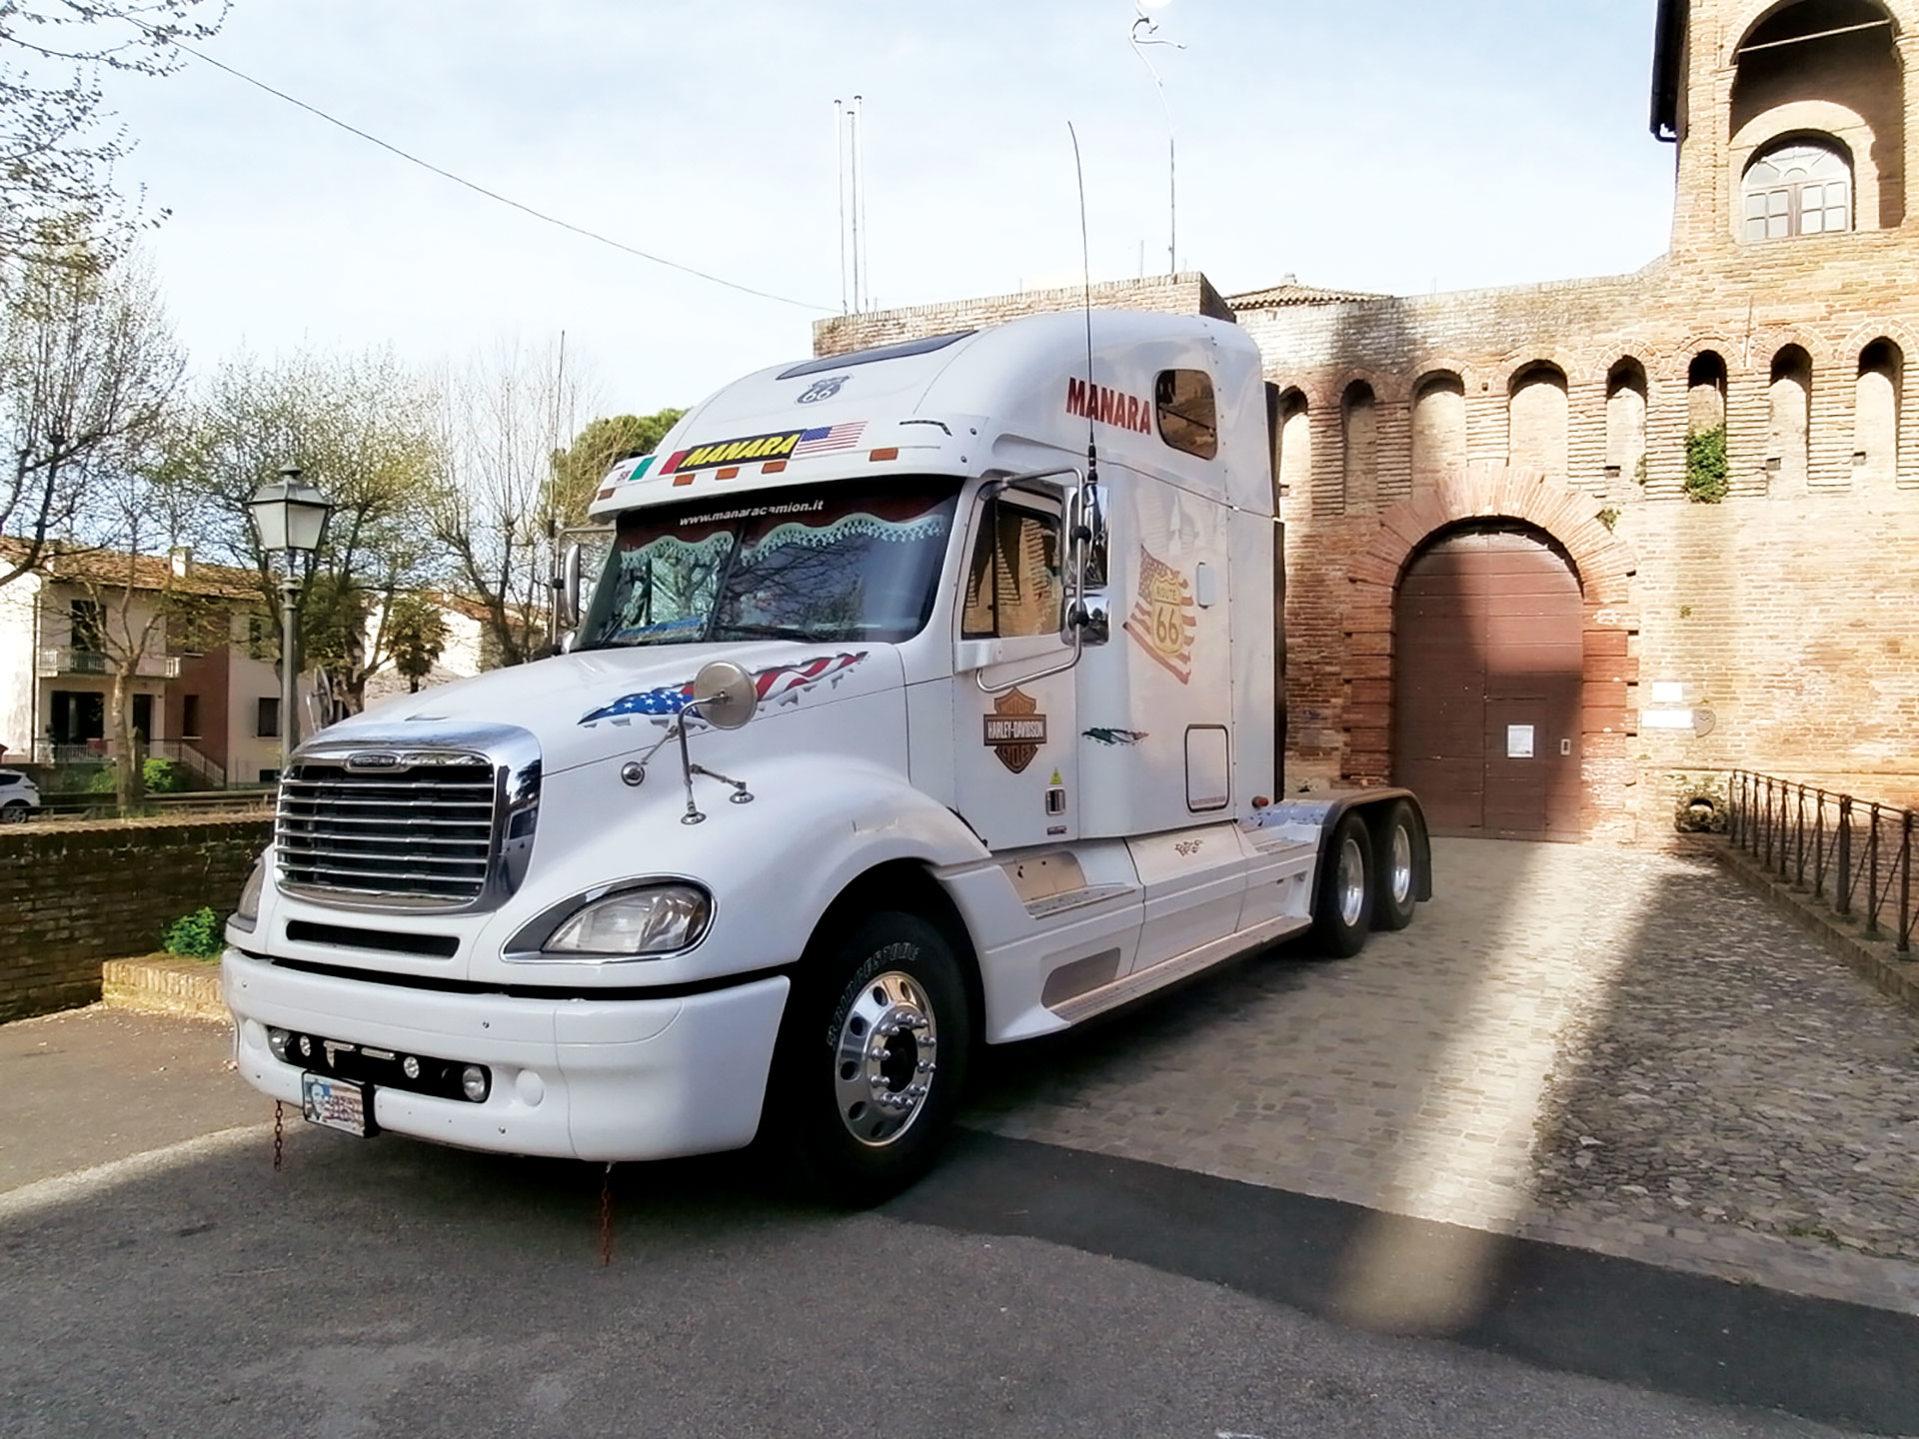 noleggio truck americano eventi - manara camion